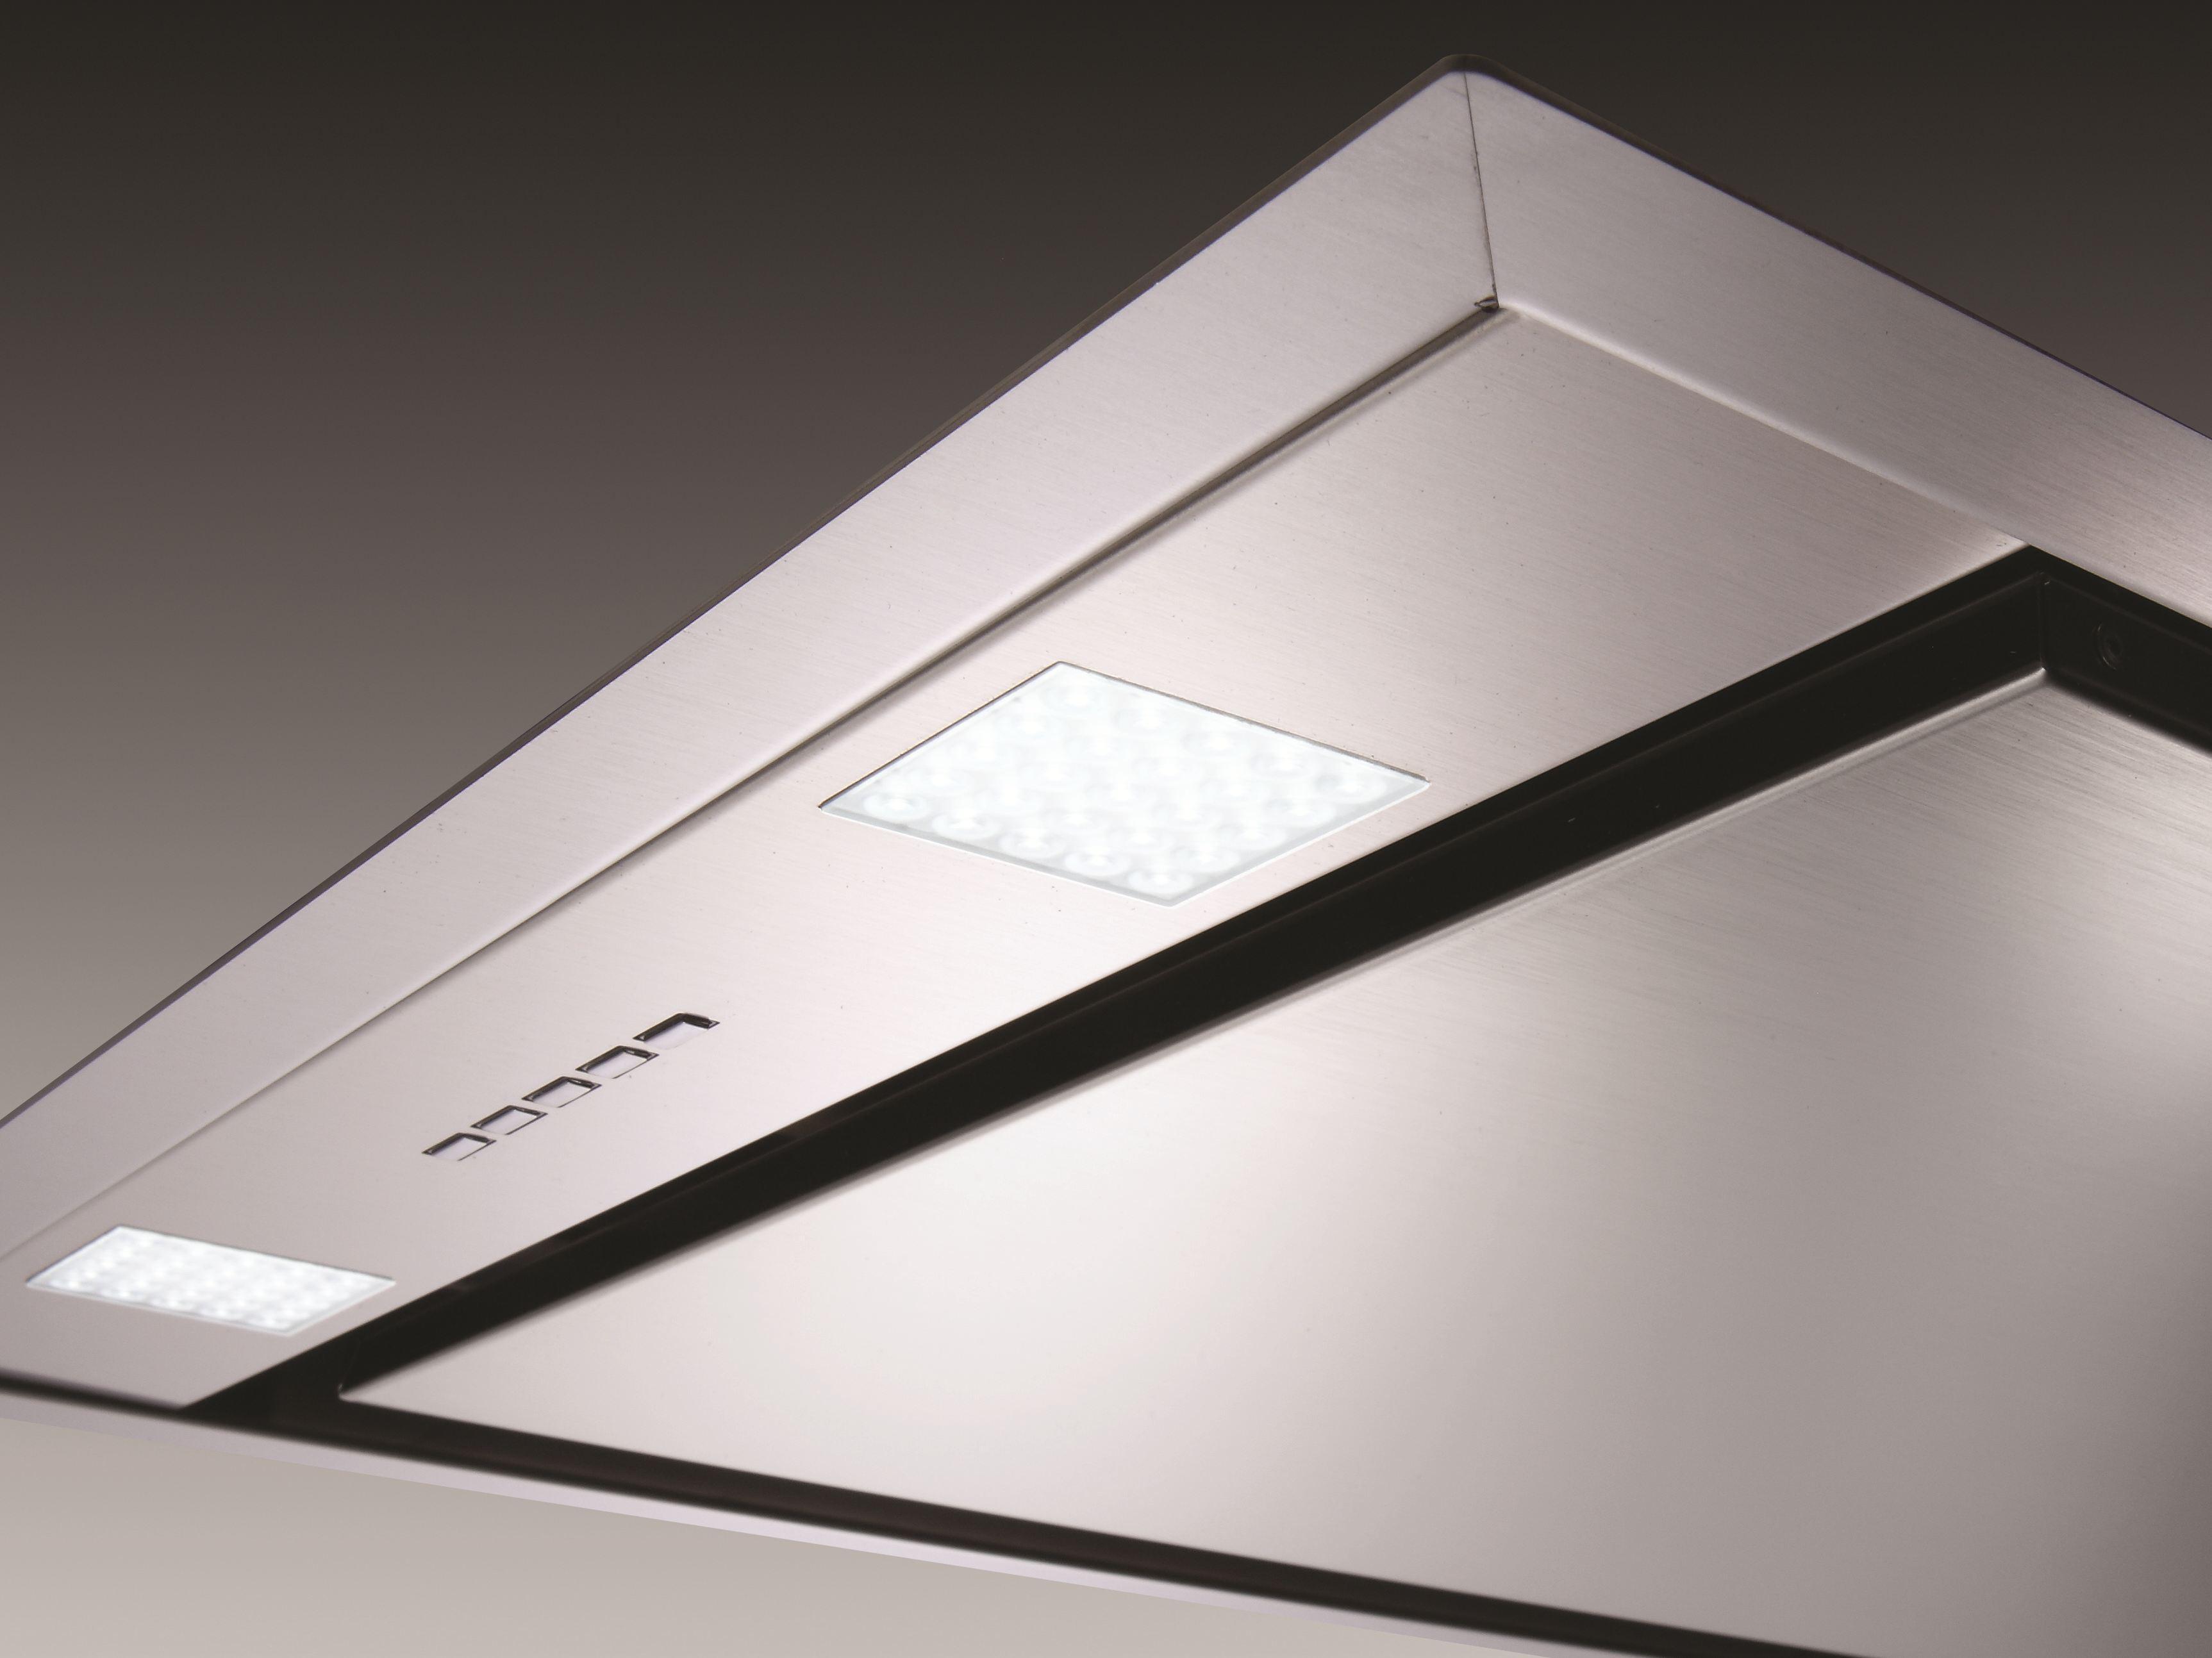 hotte de plafond falmec stella3430 electromenager grossiste. Black Bedroom Furniture Sets. Home Design Ideas